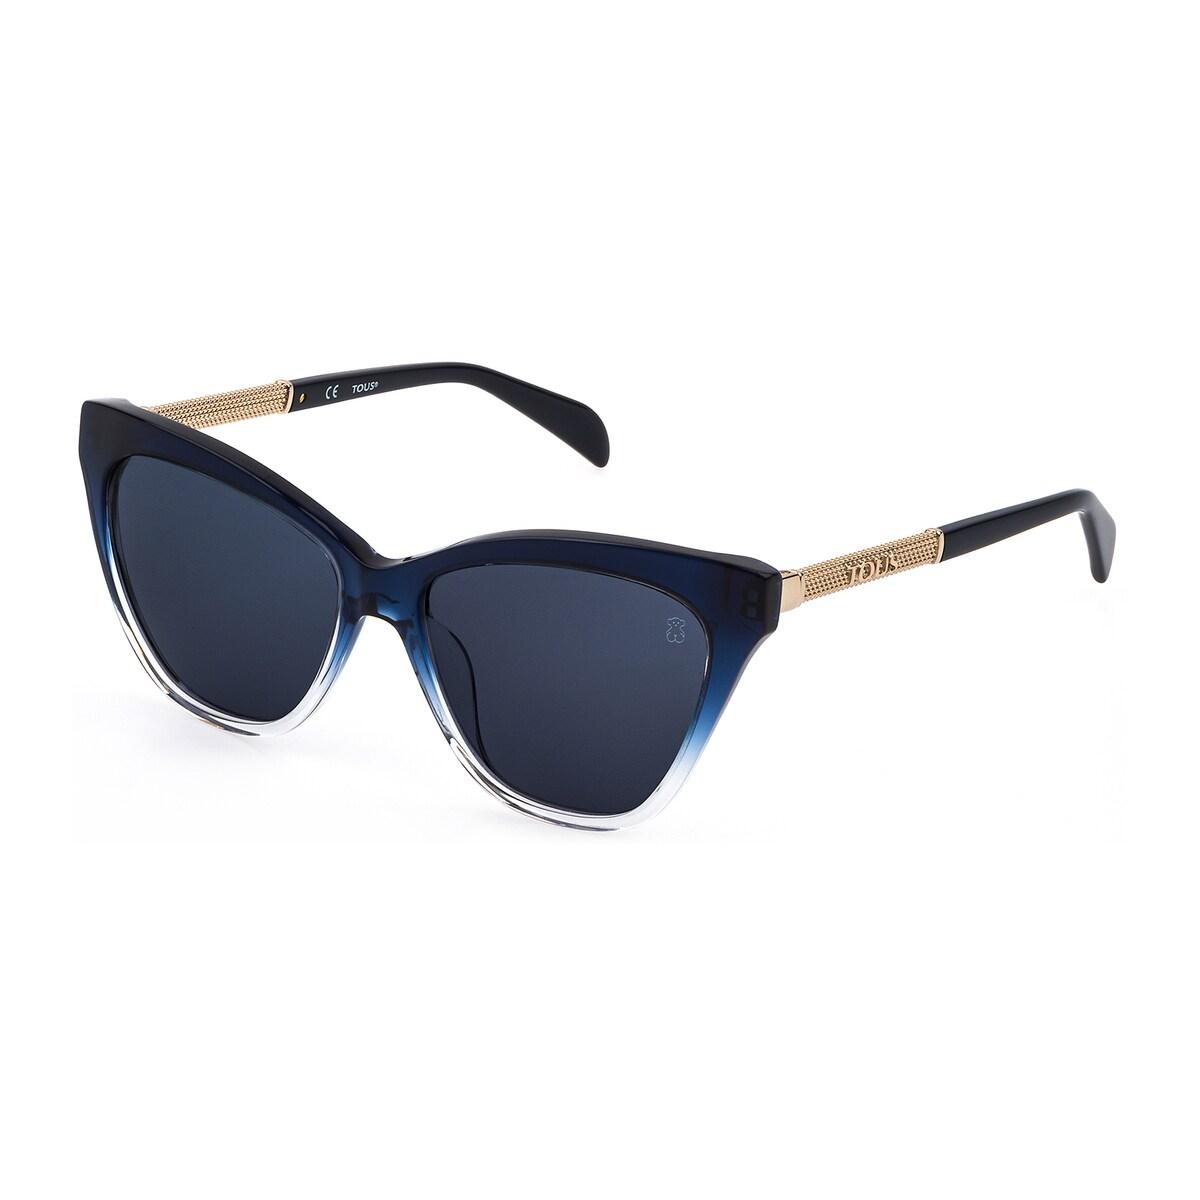 Blue Mesh Sunglasses